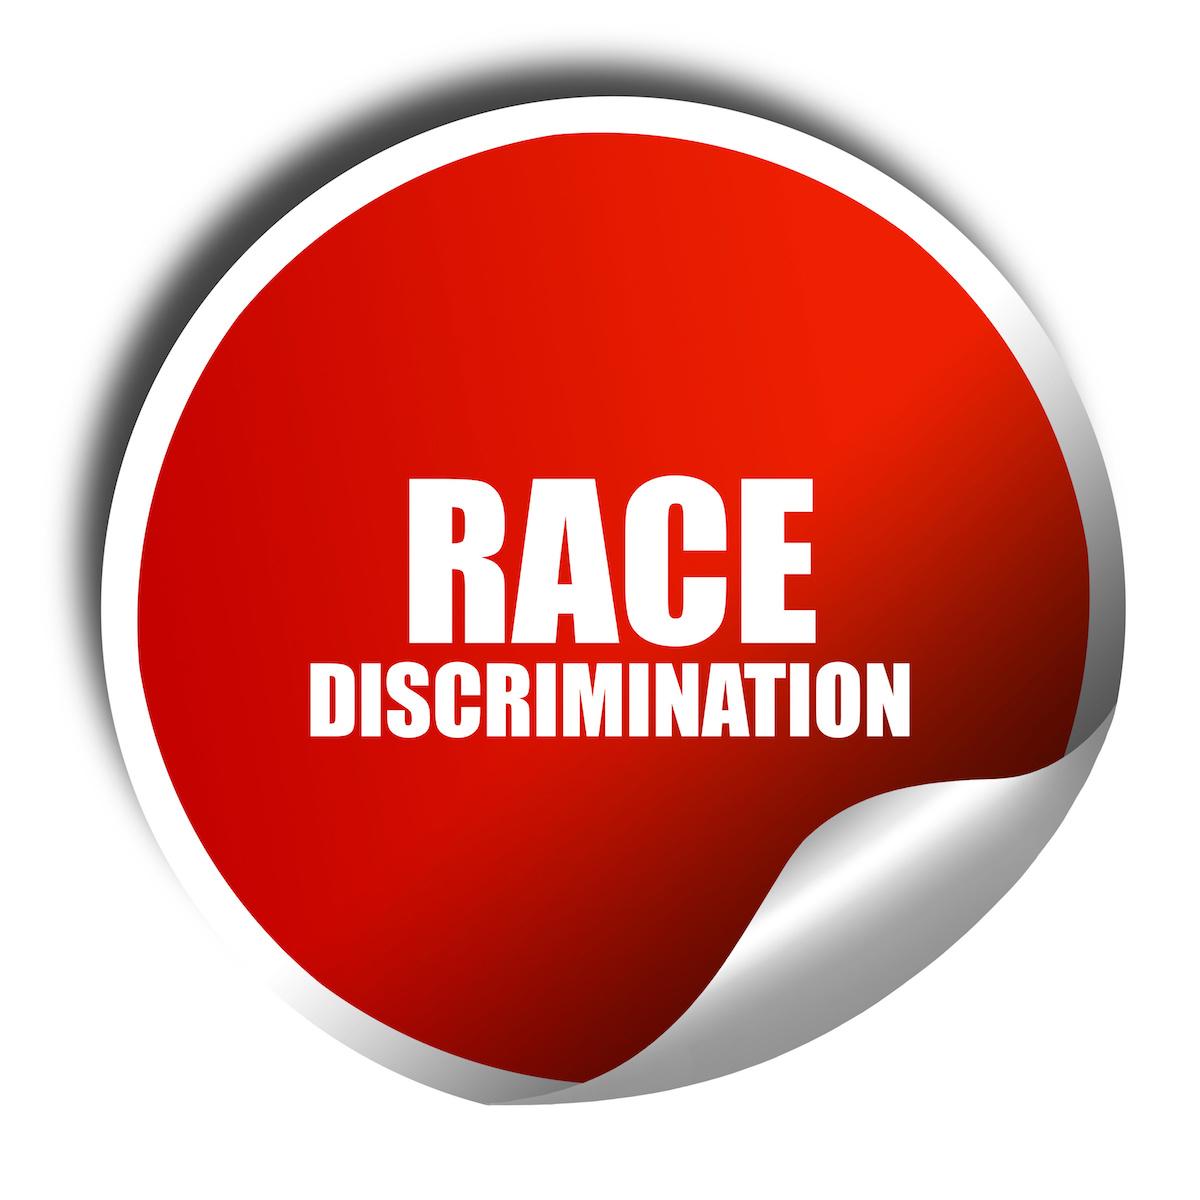 EEOC Files Racial Harassment Lawsuit Against Lancaster's BBQ